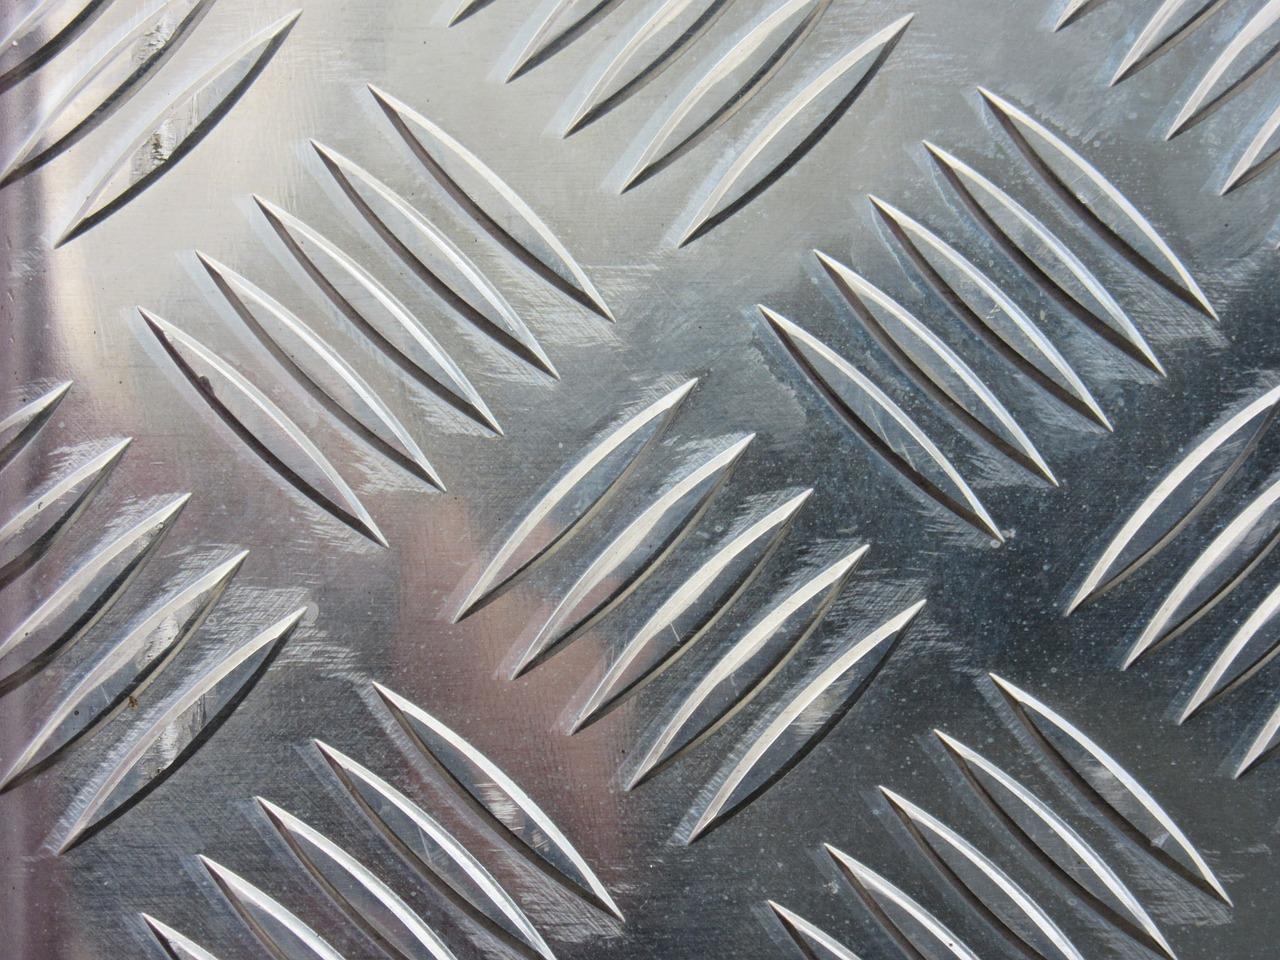 extruded aluminum heat sink manufacturing